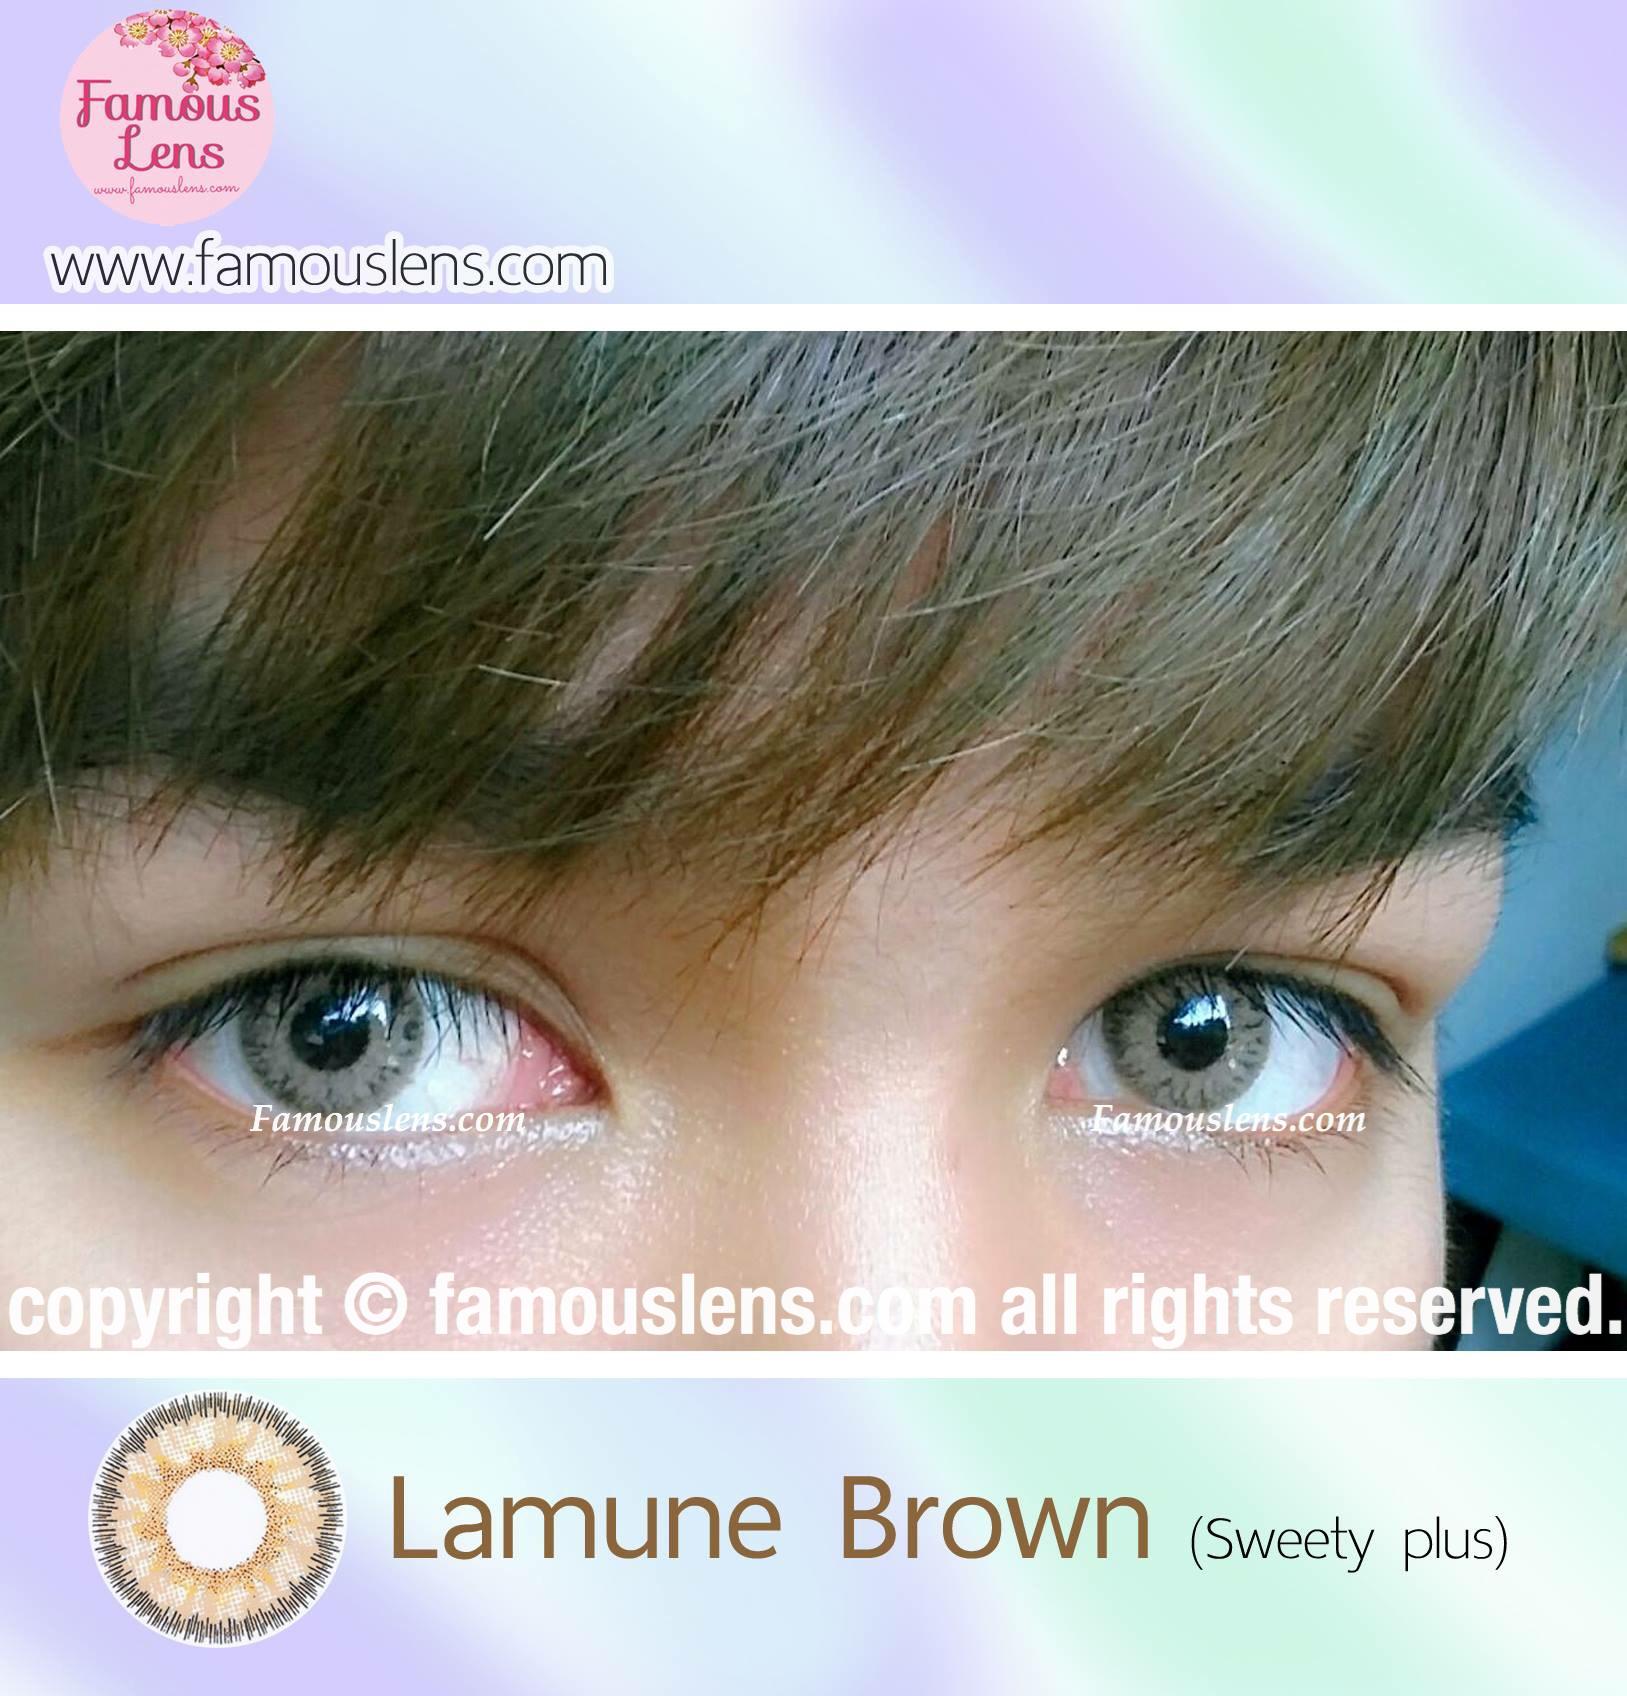 Florida Lamune Brown คอนแทคเลนส์สีน้ำตาล คอนแทคเลนส์ตาฝรั่ง